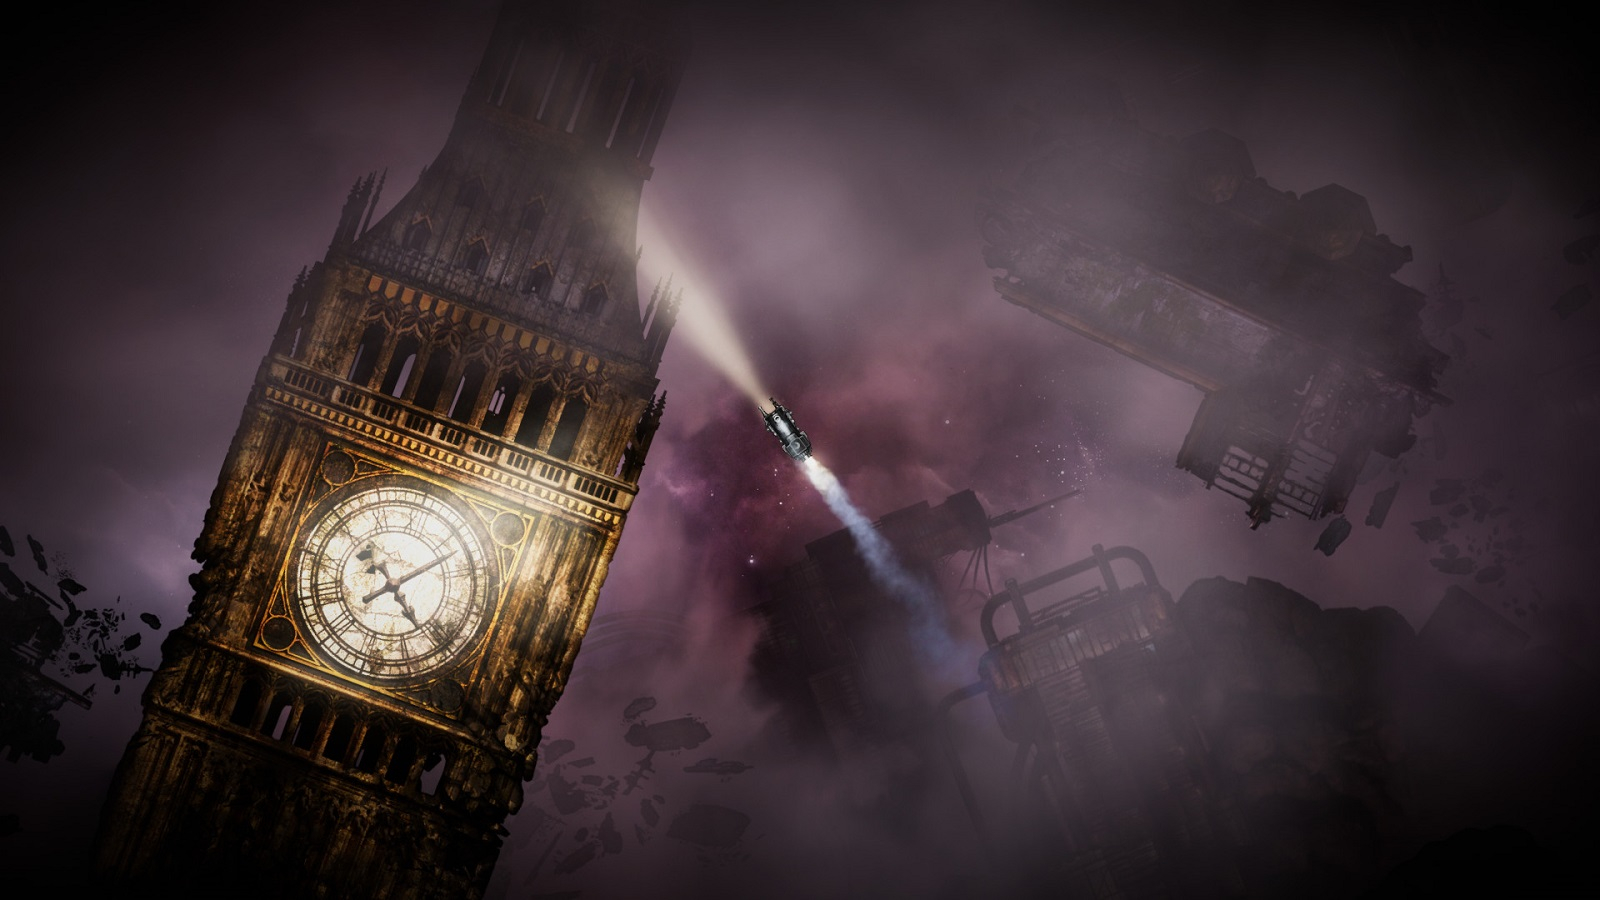 Sunless Skies: Sovereign Edition наконец получила точную дату выхода  19 мая